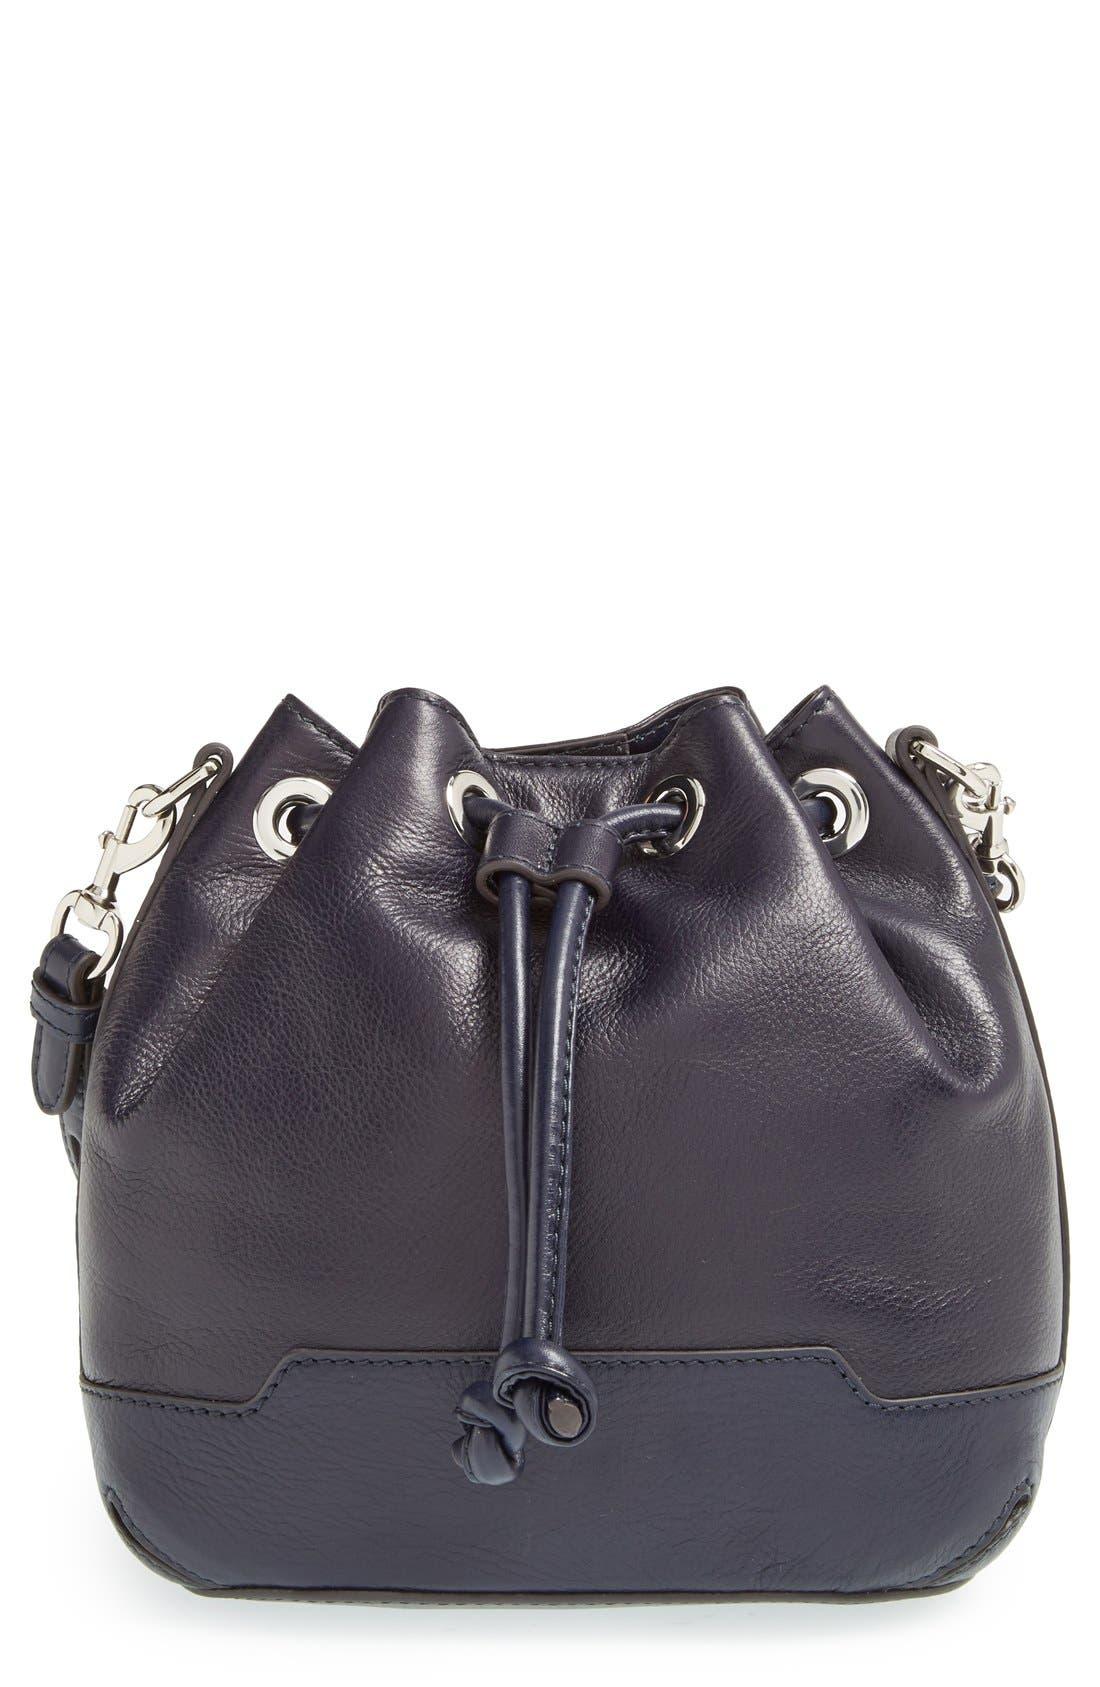 Alternate Image 1 Selected - Rebecca Minkoff 'Mini Fiona' Bucket Bag